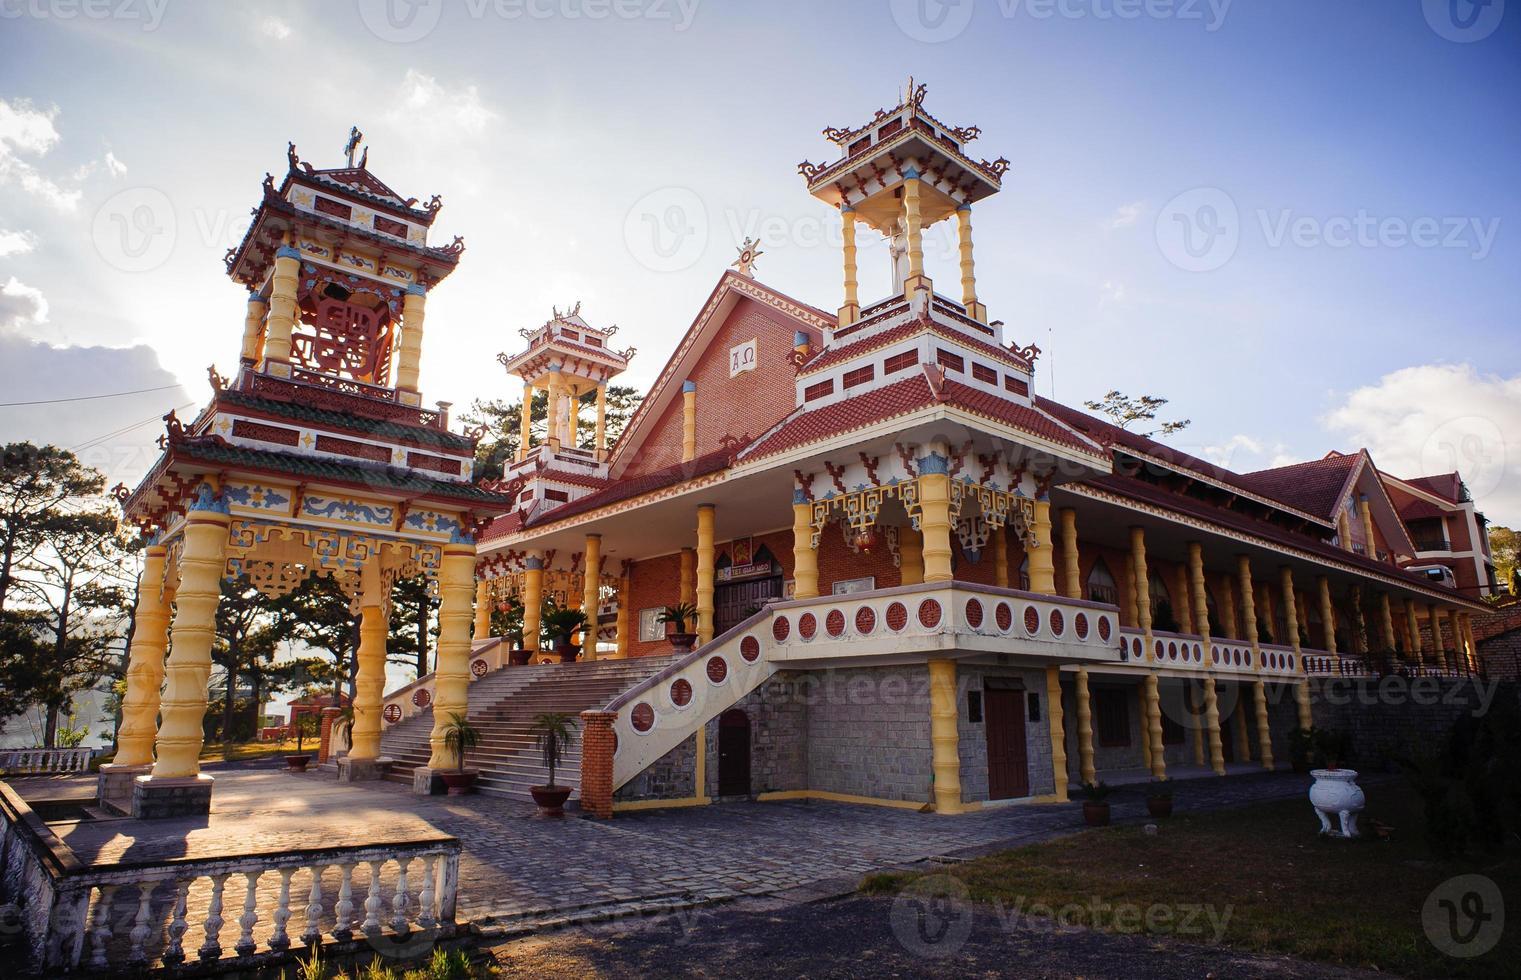 du sinh - orientalisk stil kyrka - Dalat City foto